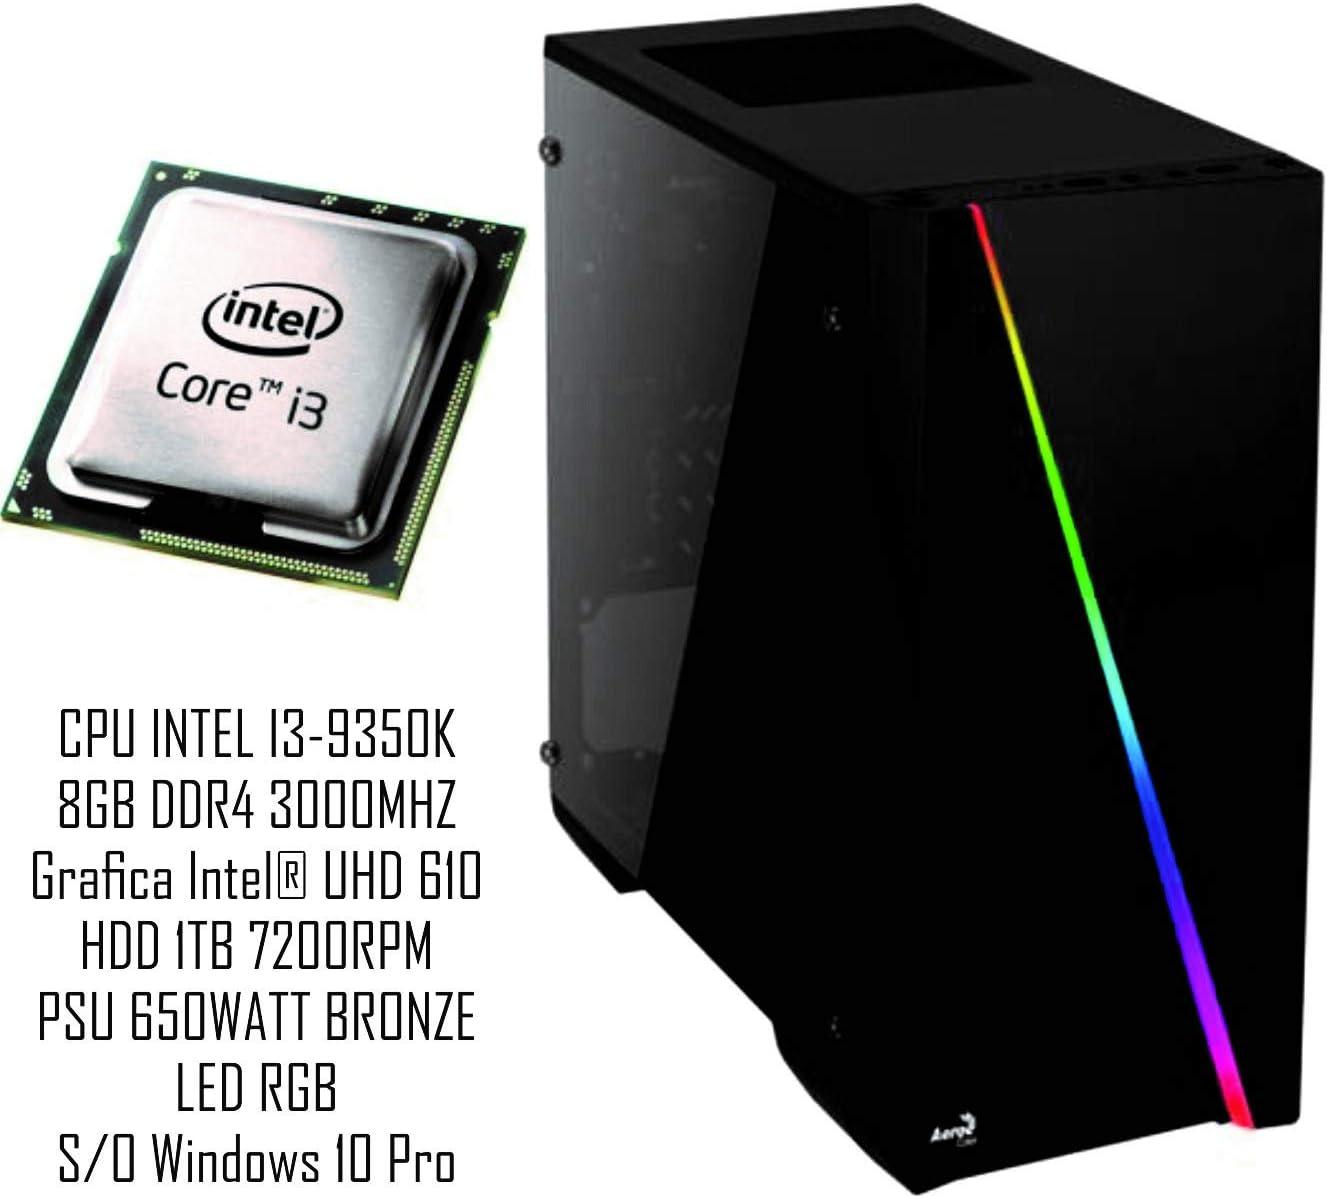 PC Gaming Redi GX4010TB Intel i3-9350k B365M DDR4 8GB 3000 1TB 7200RPM 650W bronce